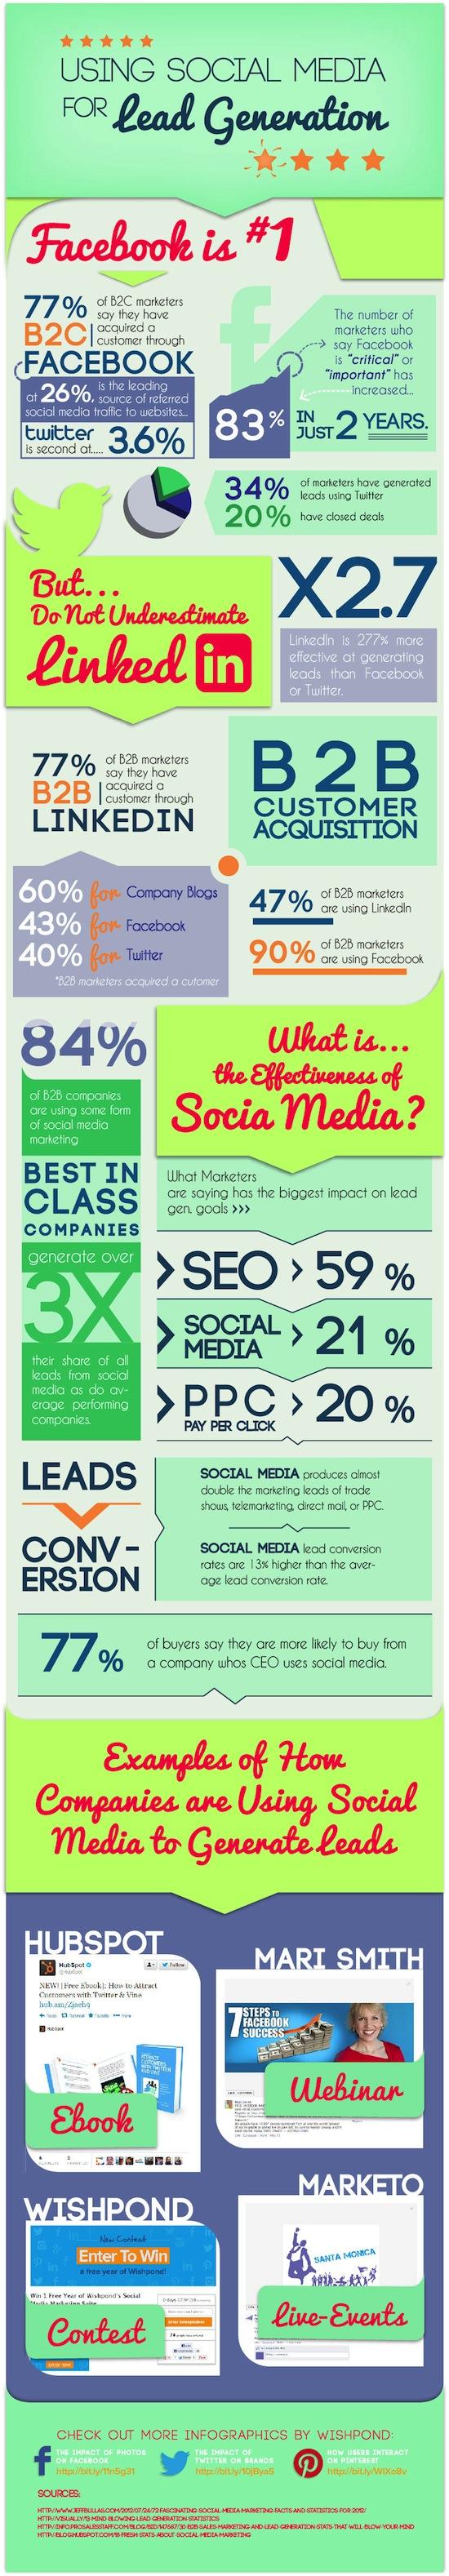 Using-social-media-for-lead-generation